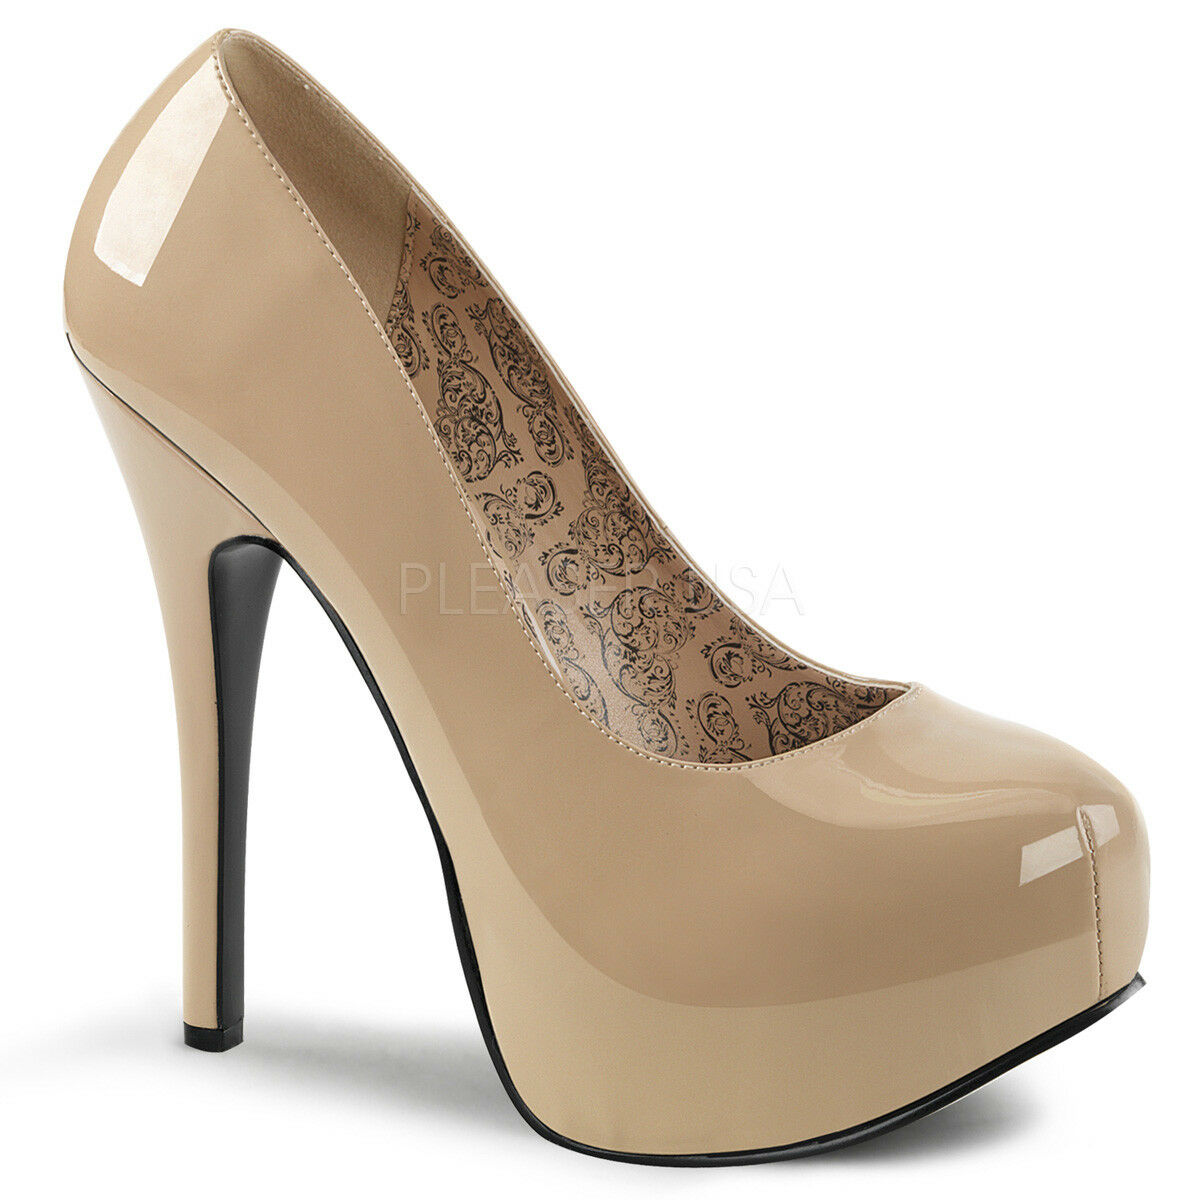 Pleaser Teeze Teeze Teeze - 06W Para mujeres Informal Crema patente Bomba De Plataforma Oculta Tacones Zapatos  nuevo sádico